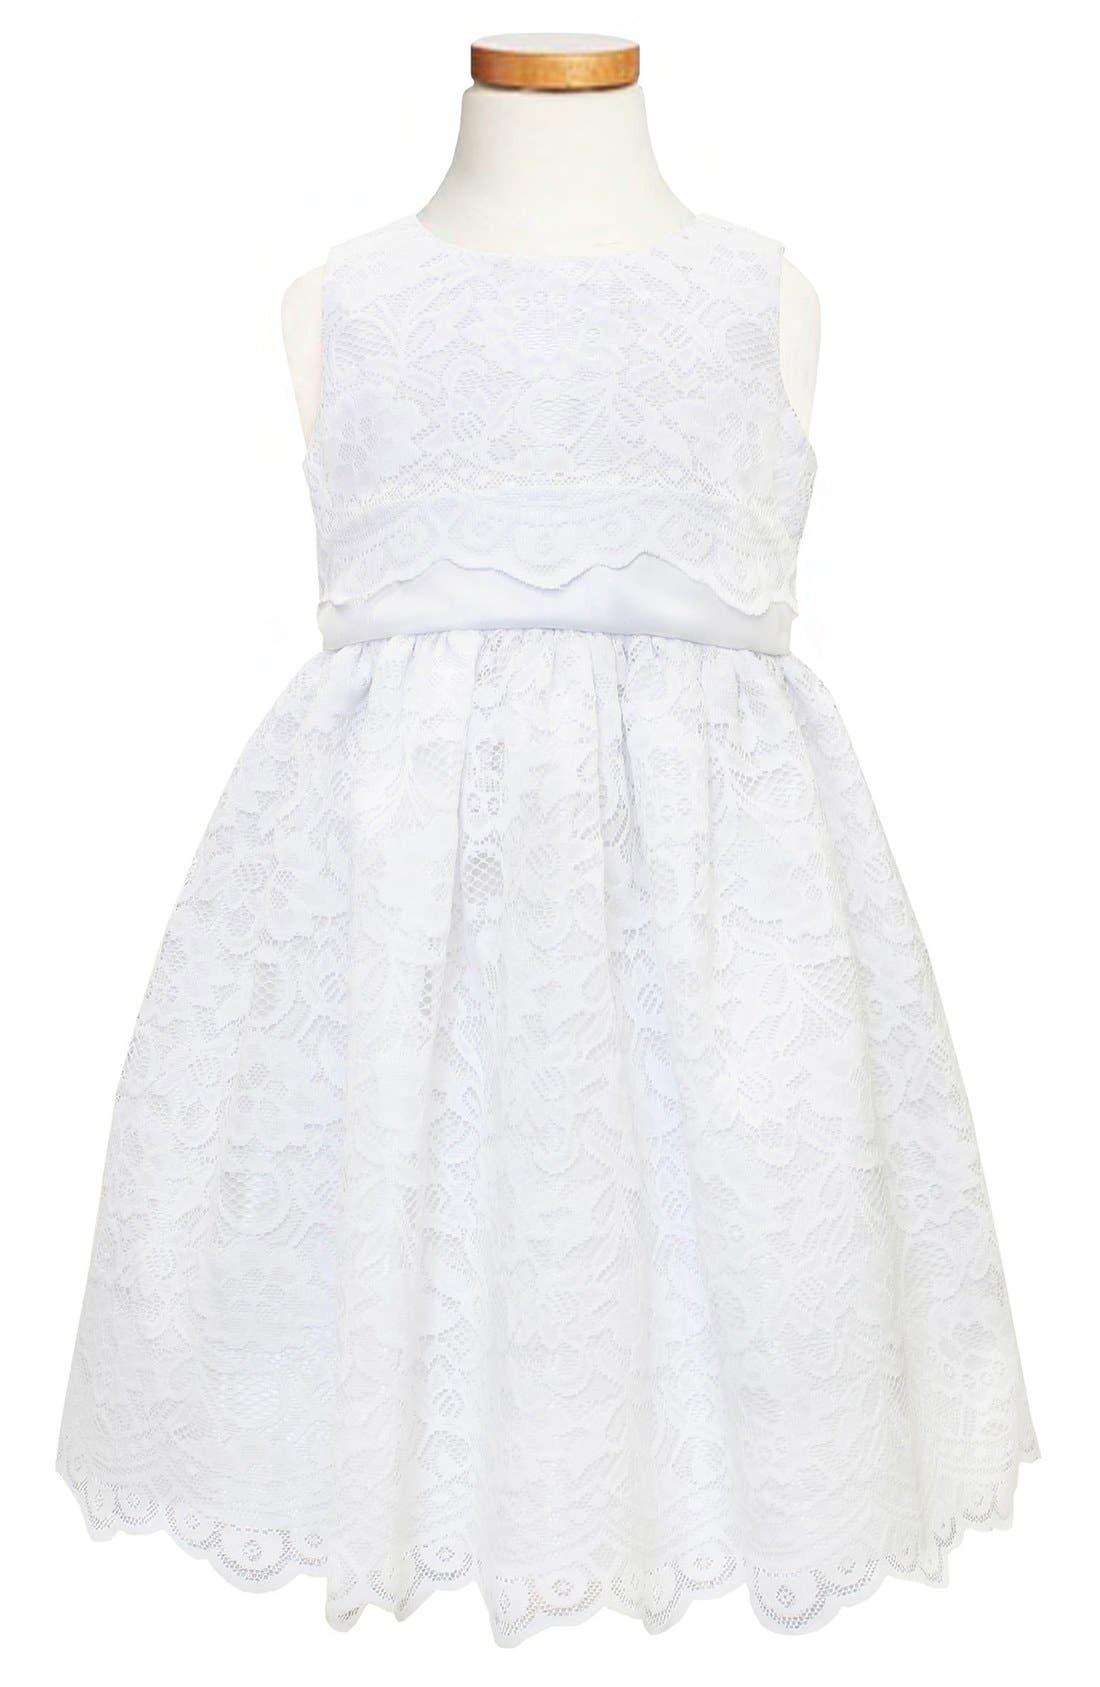 Alternate Image 1 Selected - Sorbet Scallop Lace Dress (Toddler Girls & Little Girls)